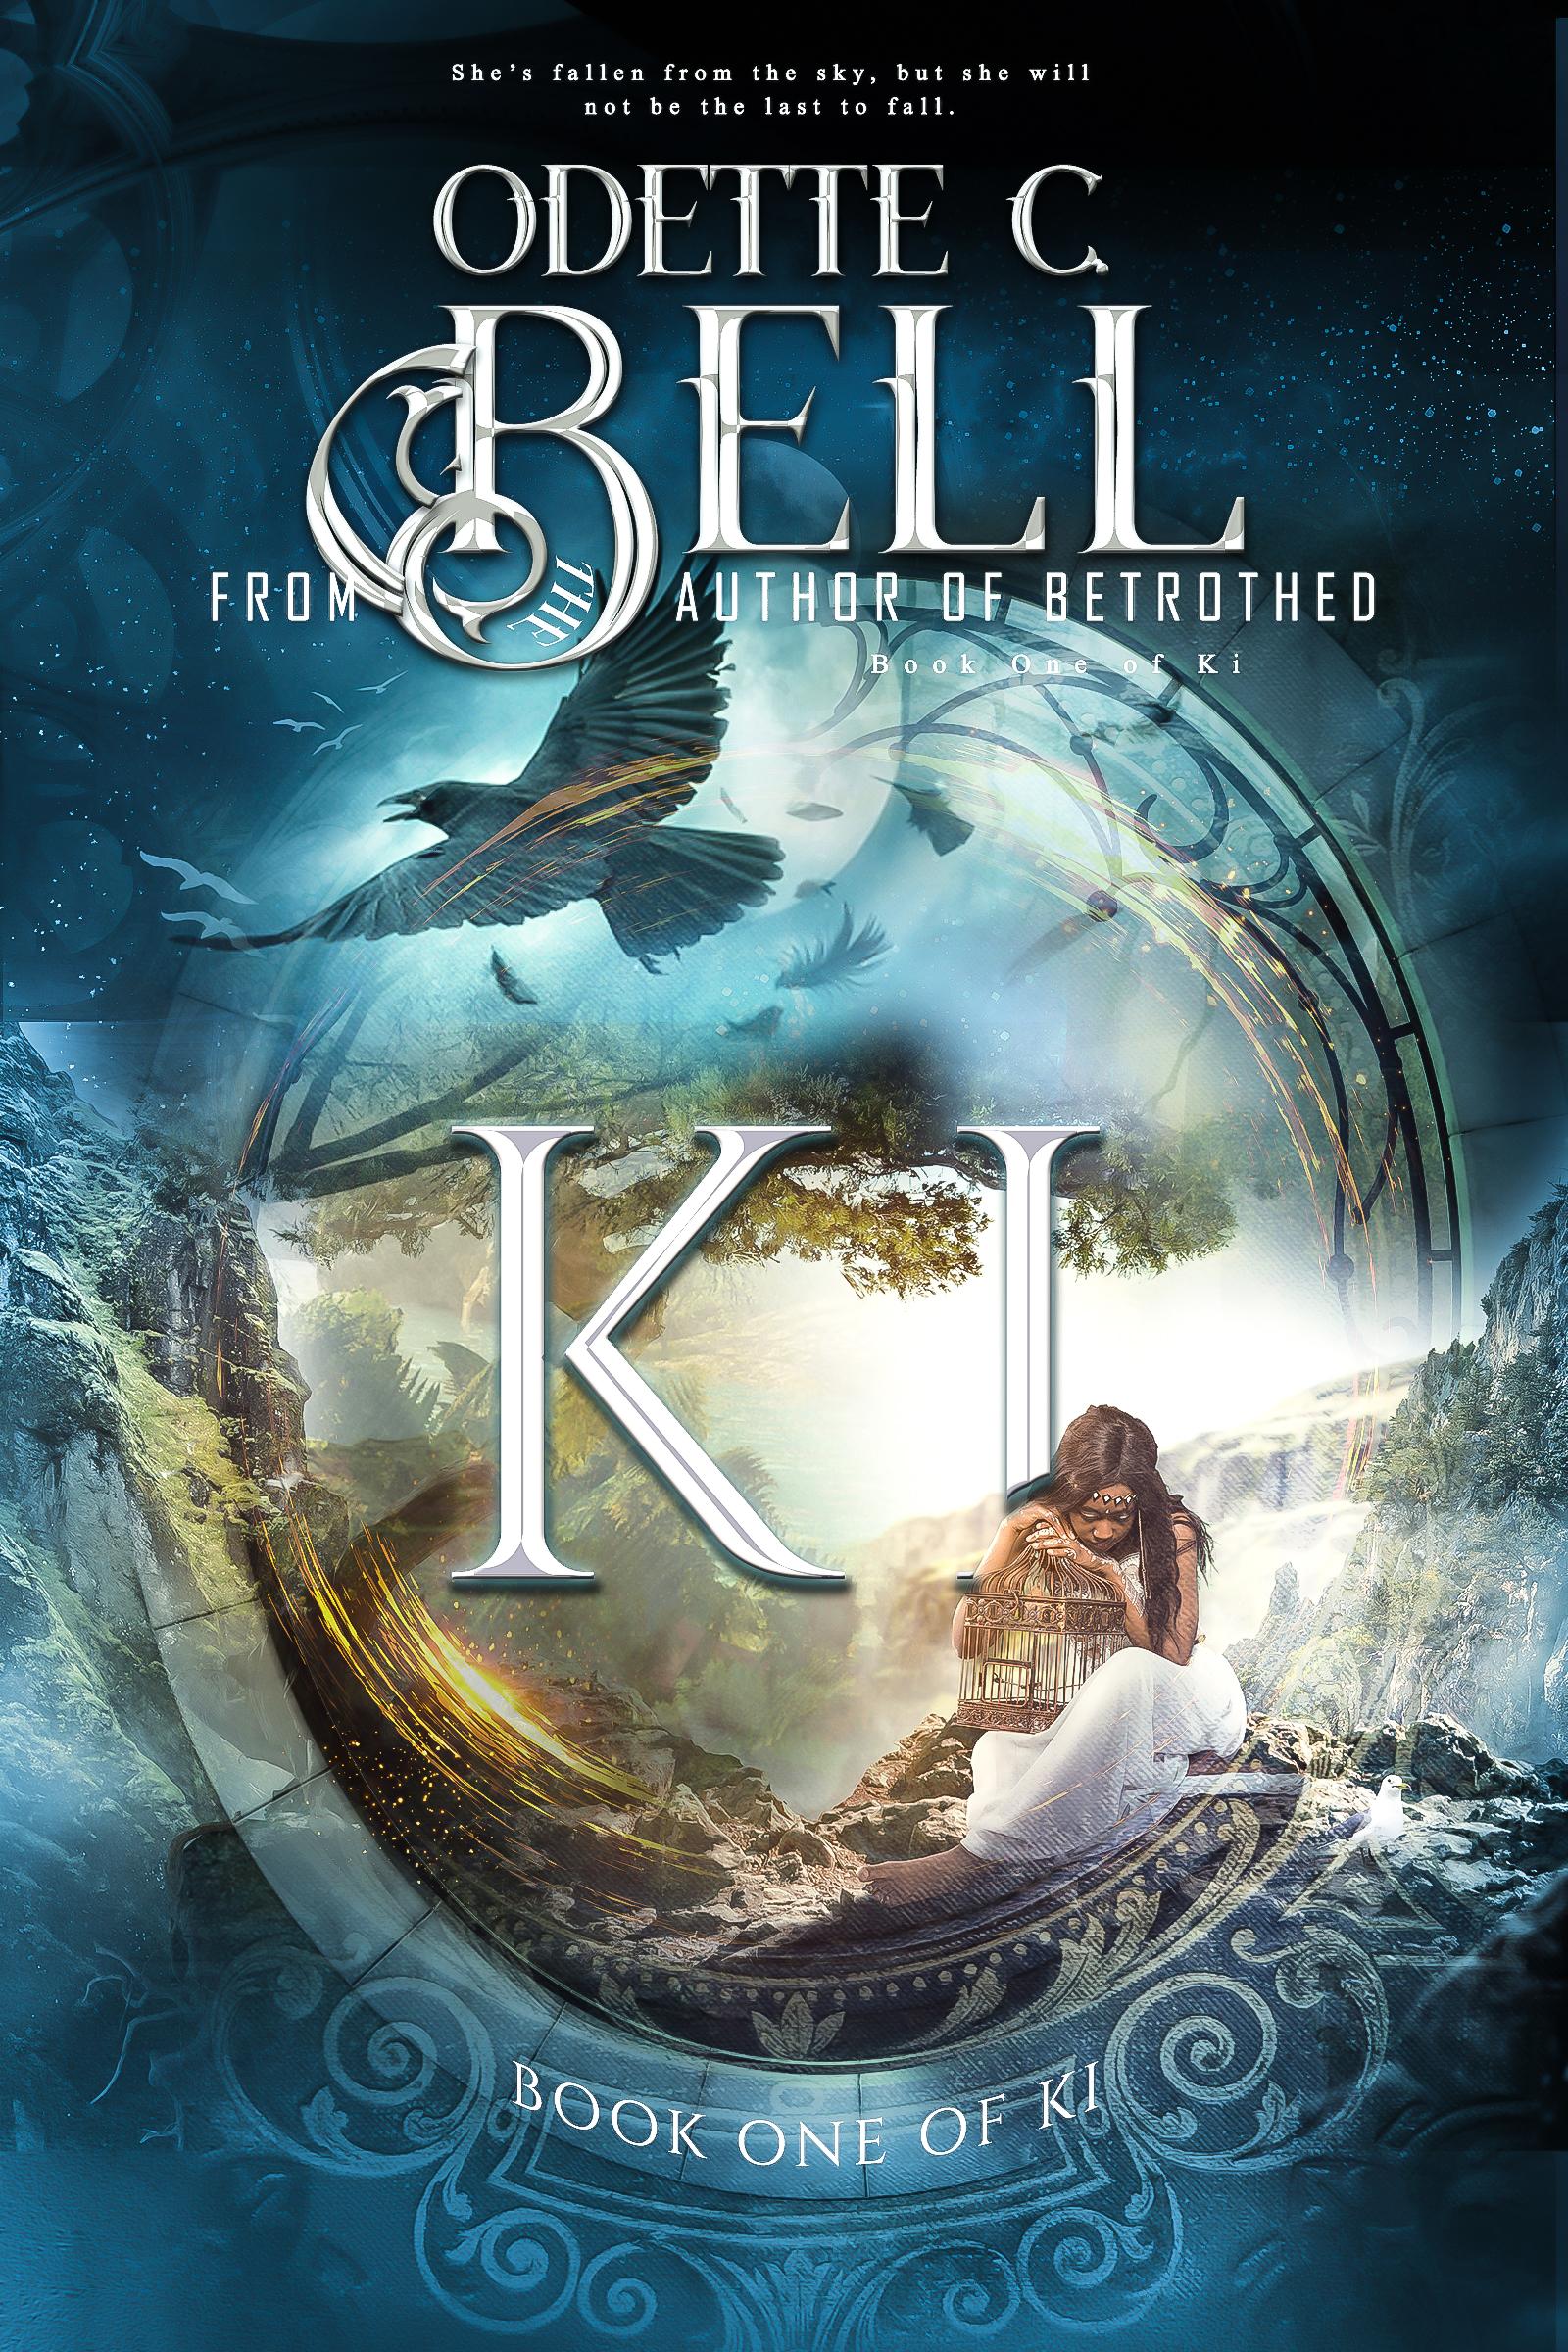 Ki Book One (sst-lxxxv)